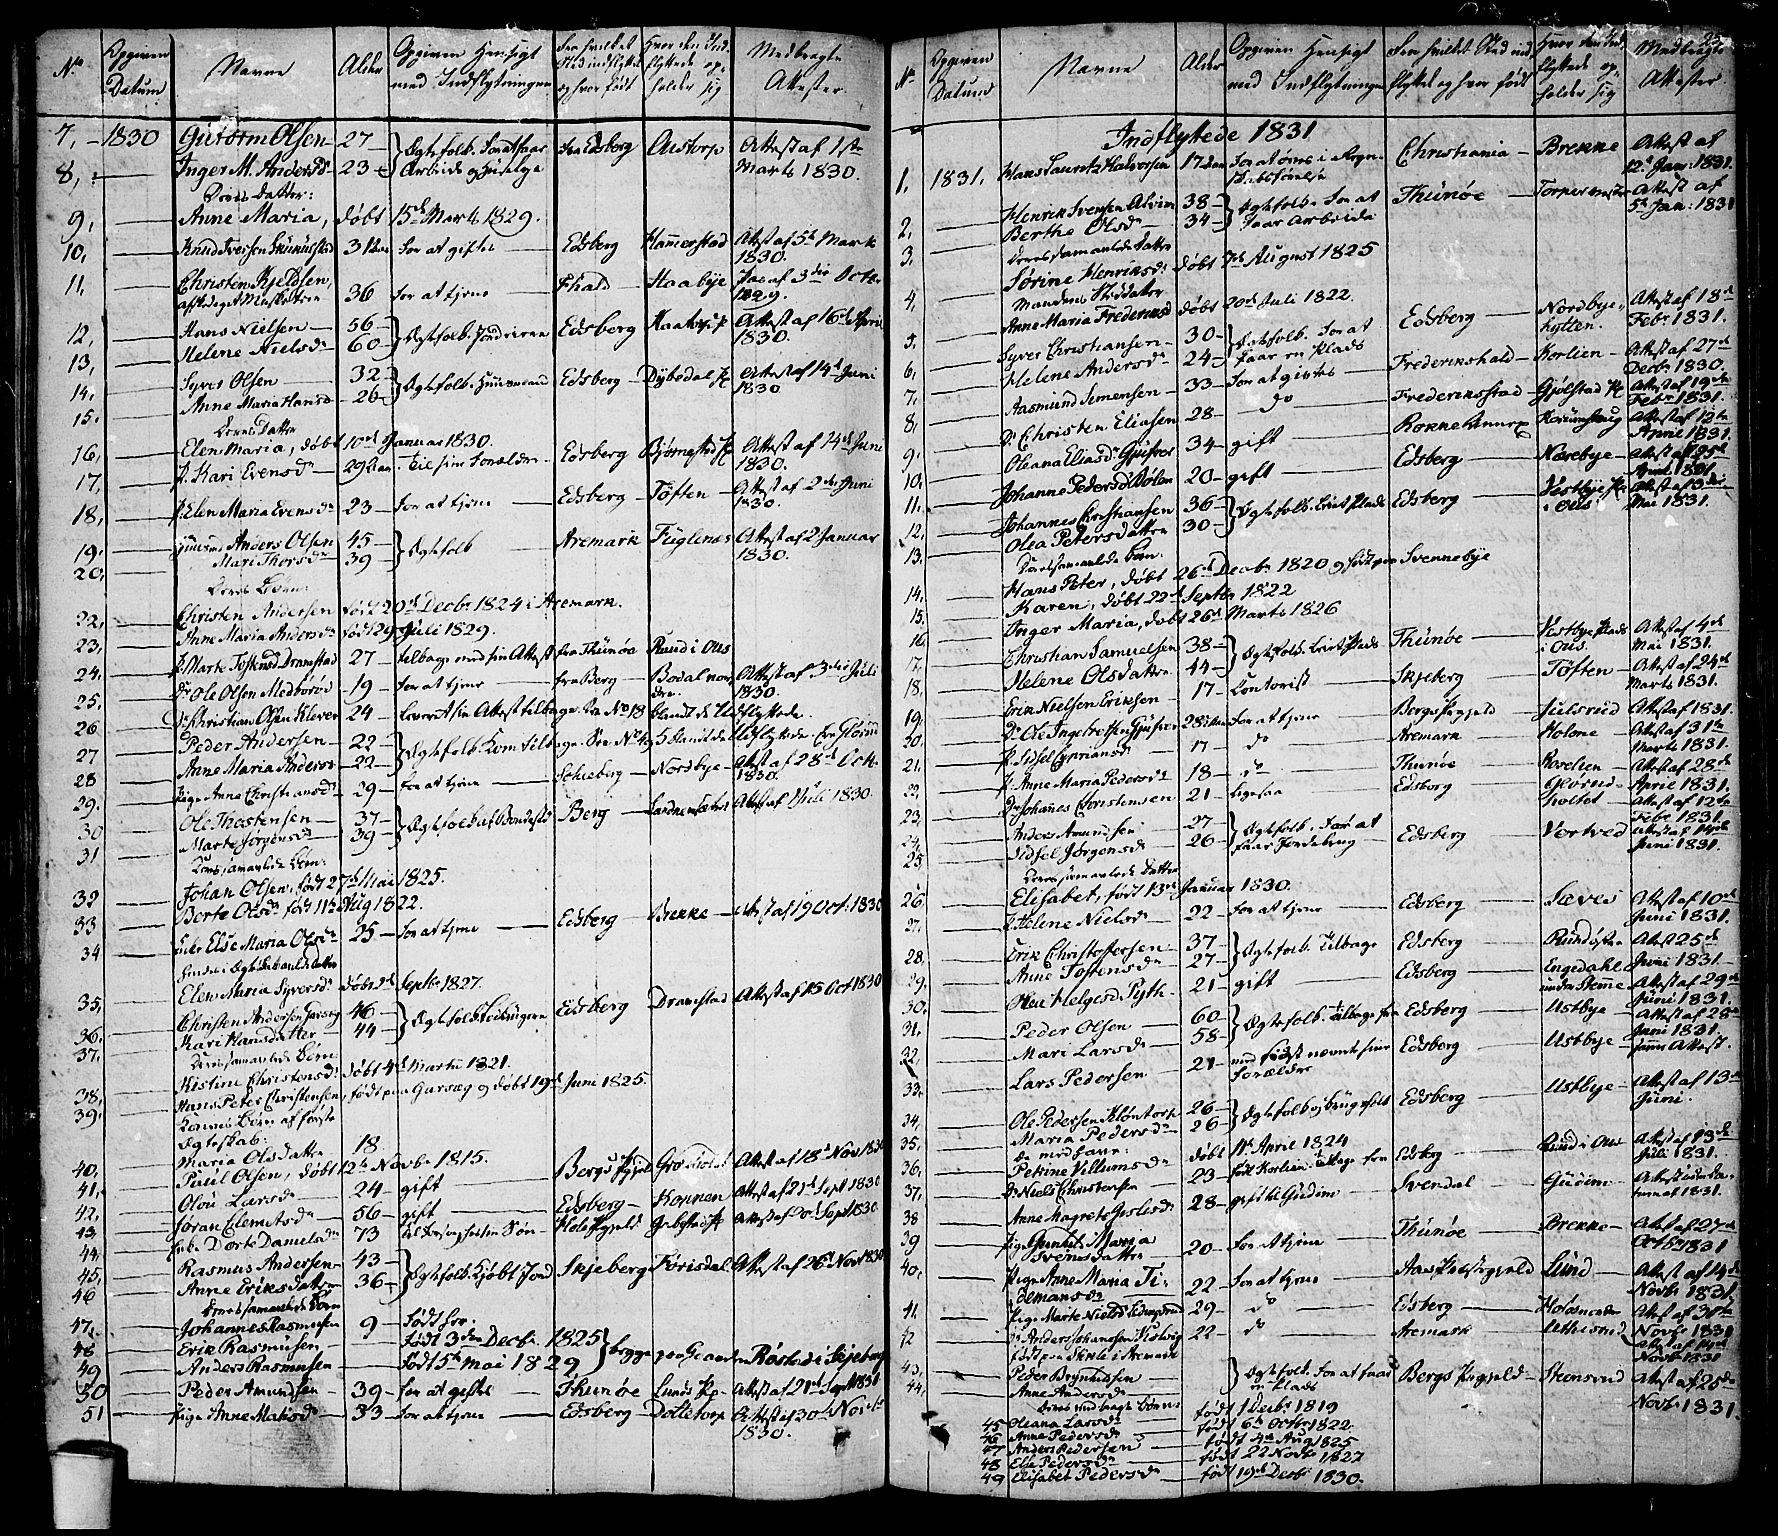 SAO, Rakkestad prestekontor Kirkebøker, F/Fa/L0007: Ministerialbok nr. I 7, 1825-1841, s. 253